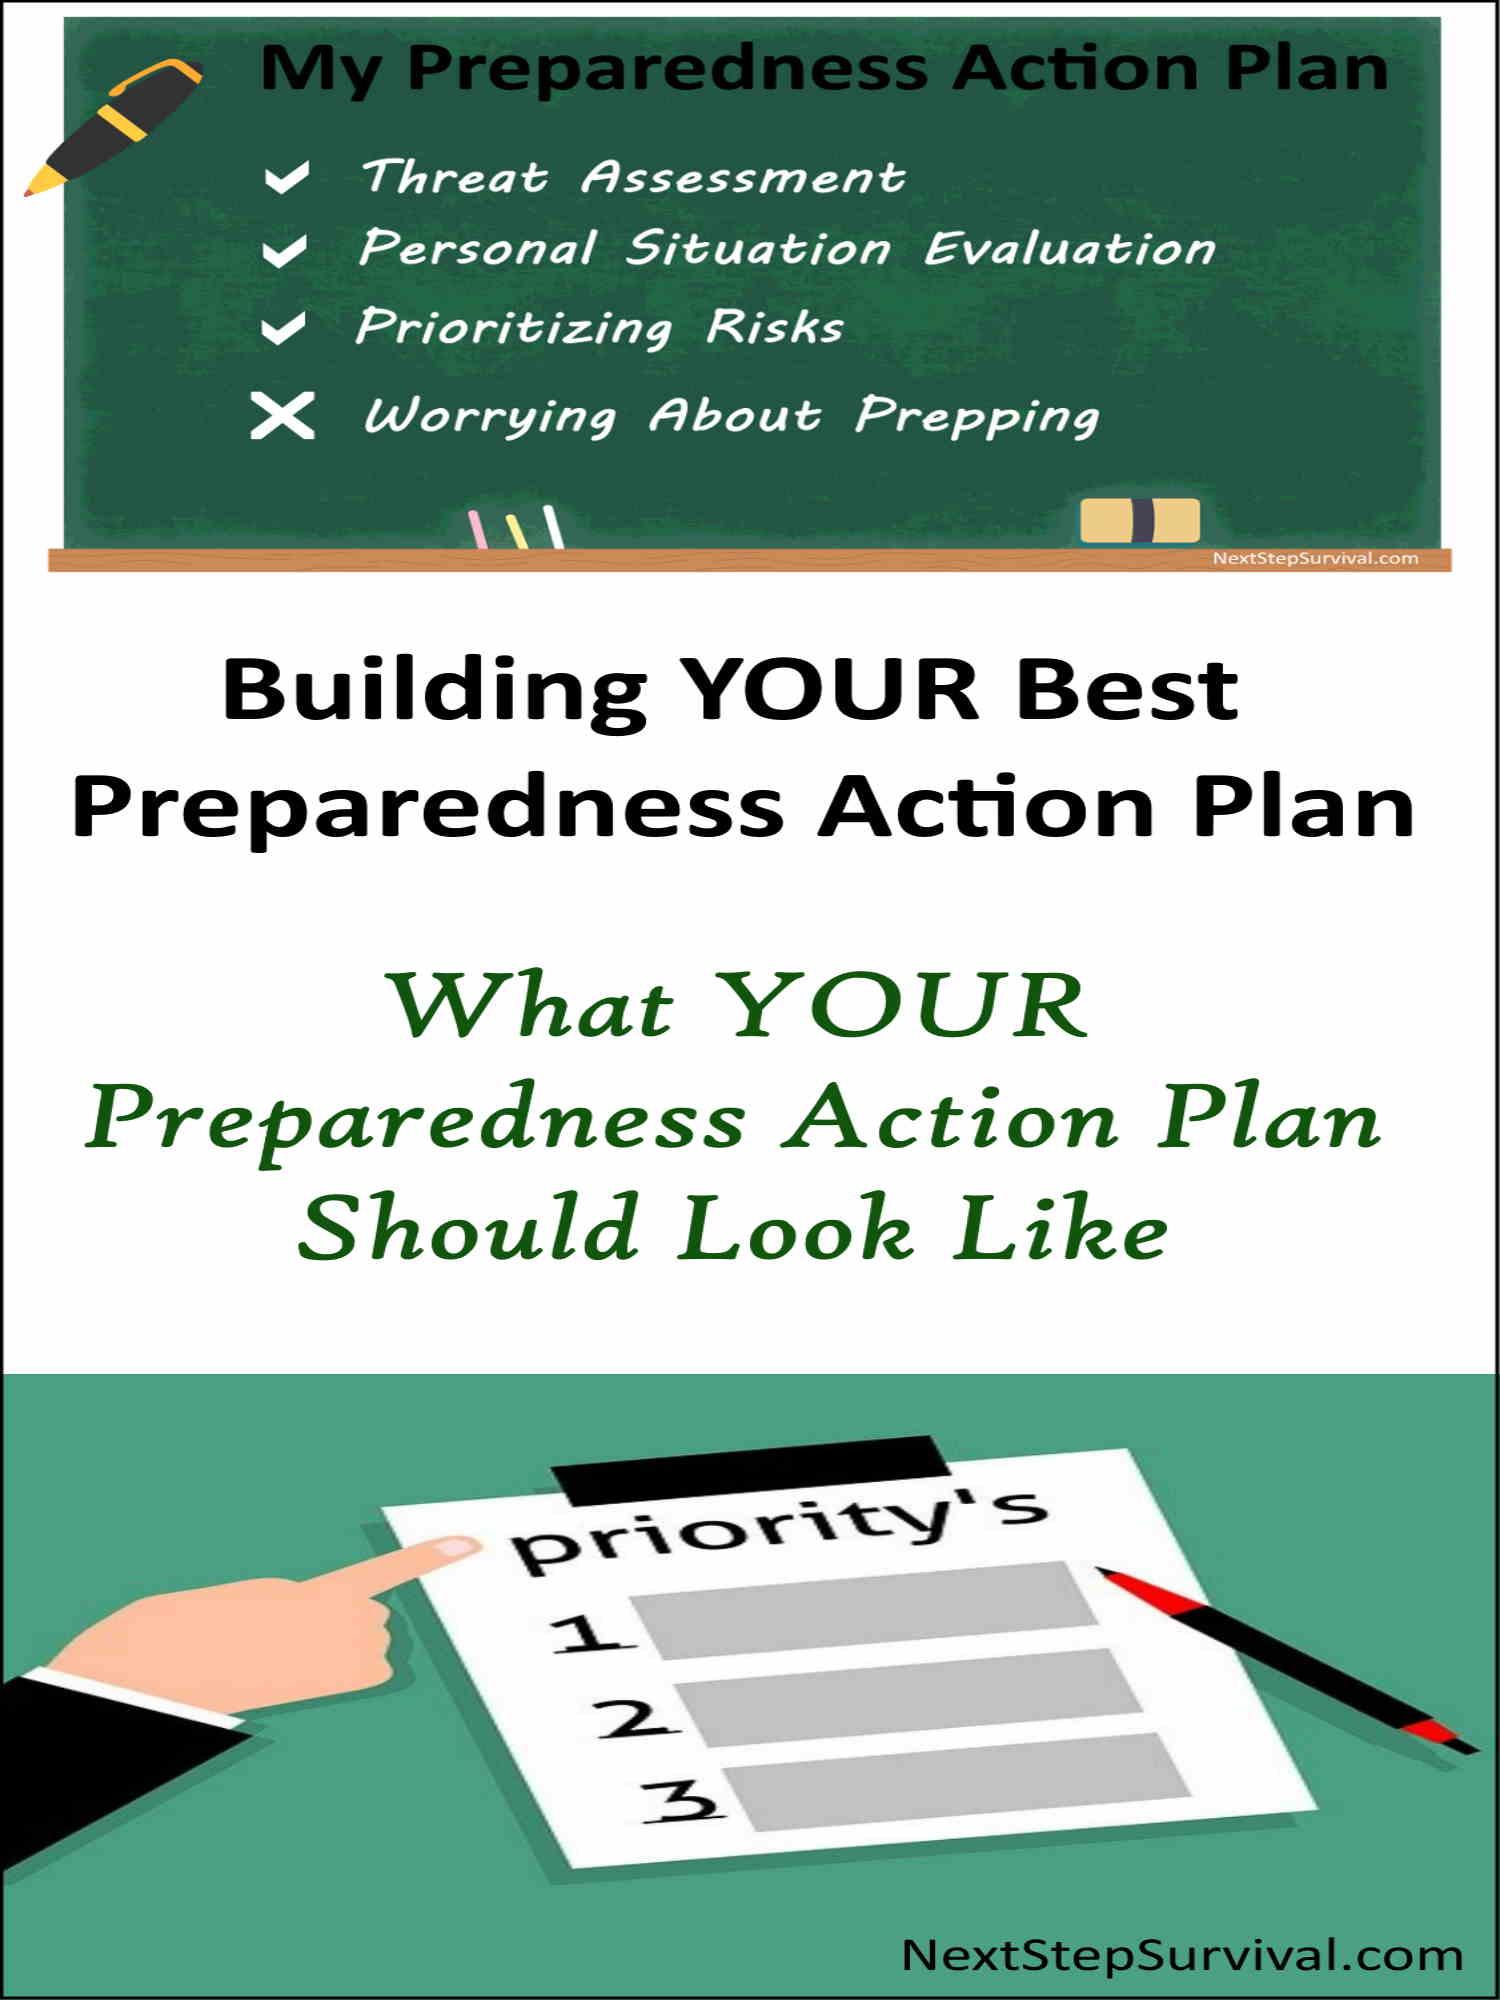 Pinterest Image - Preparedness Action Plan